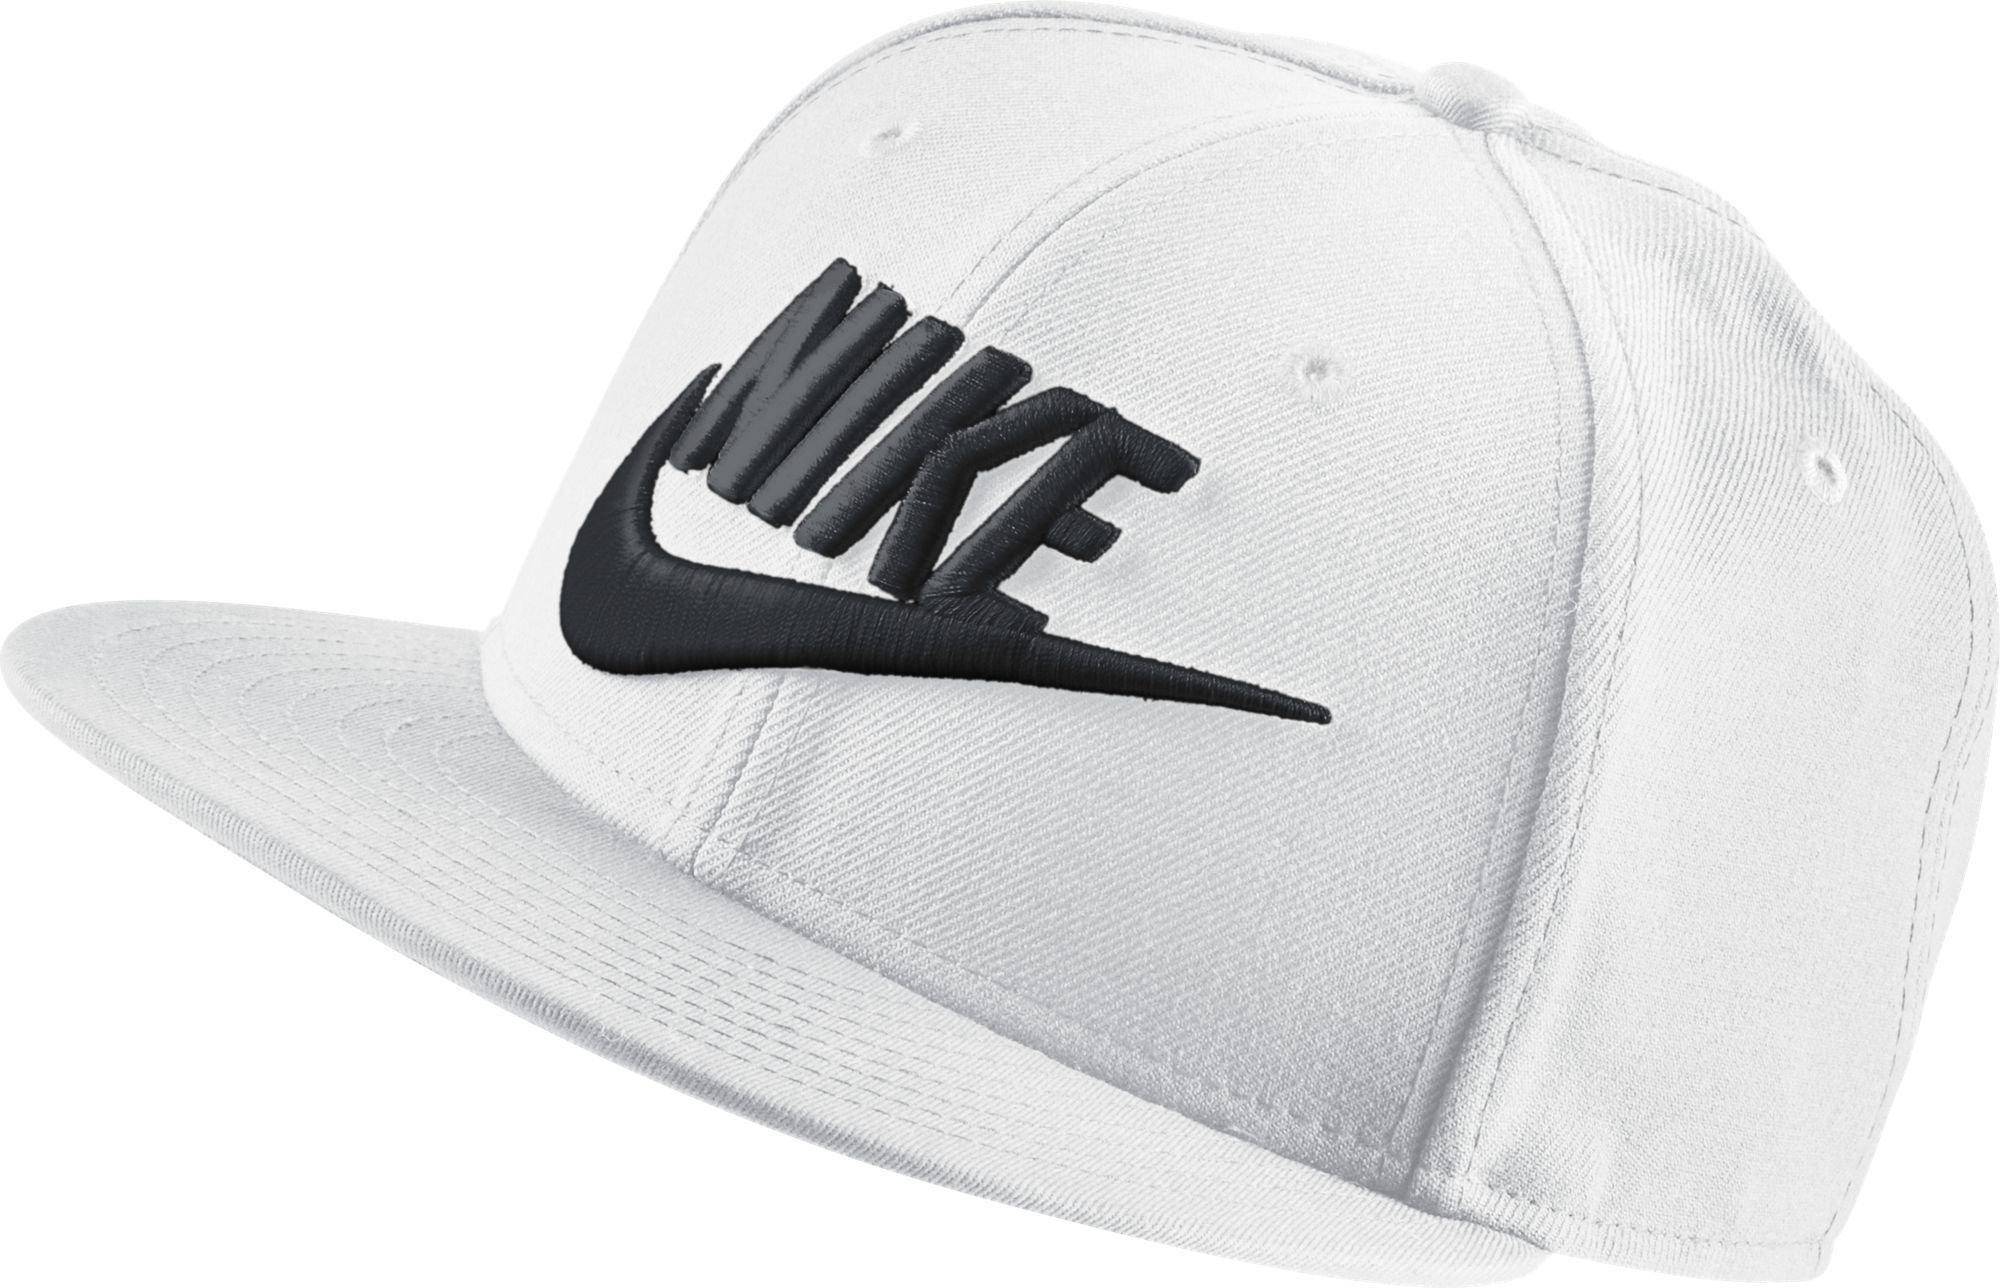 Galleon - NIKE Mens Futura True 2 Adjustable Snapback Hat White Black  584169-436 2348dc93e36